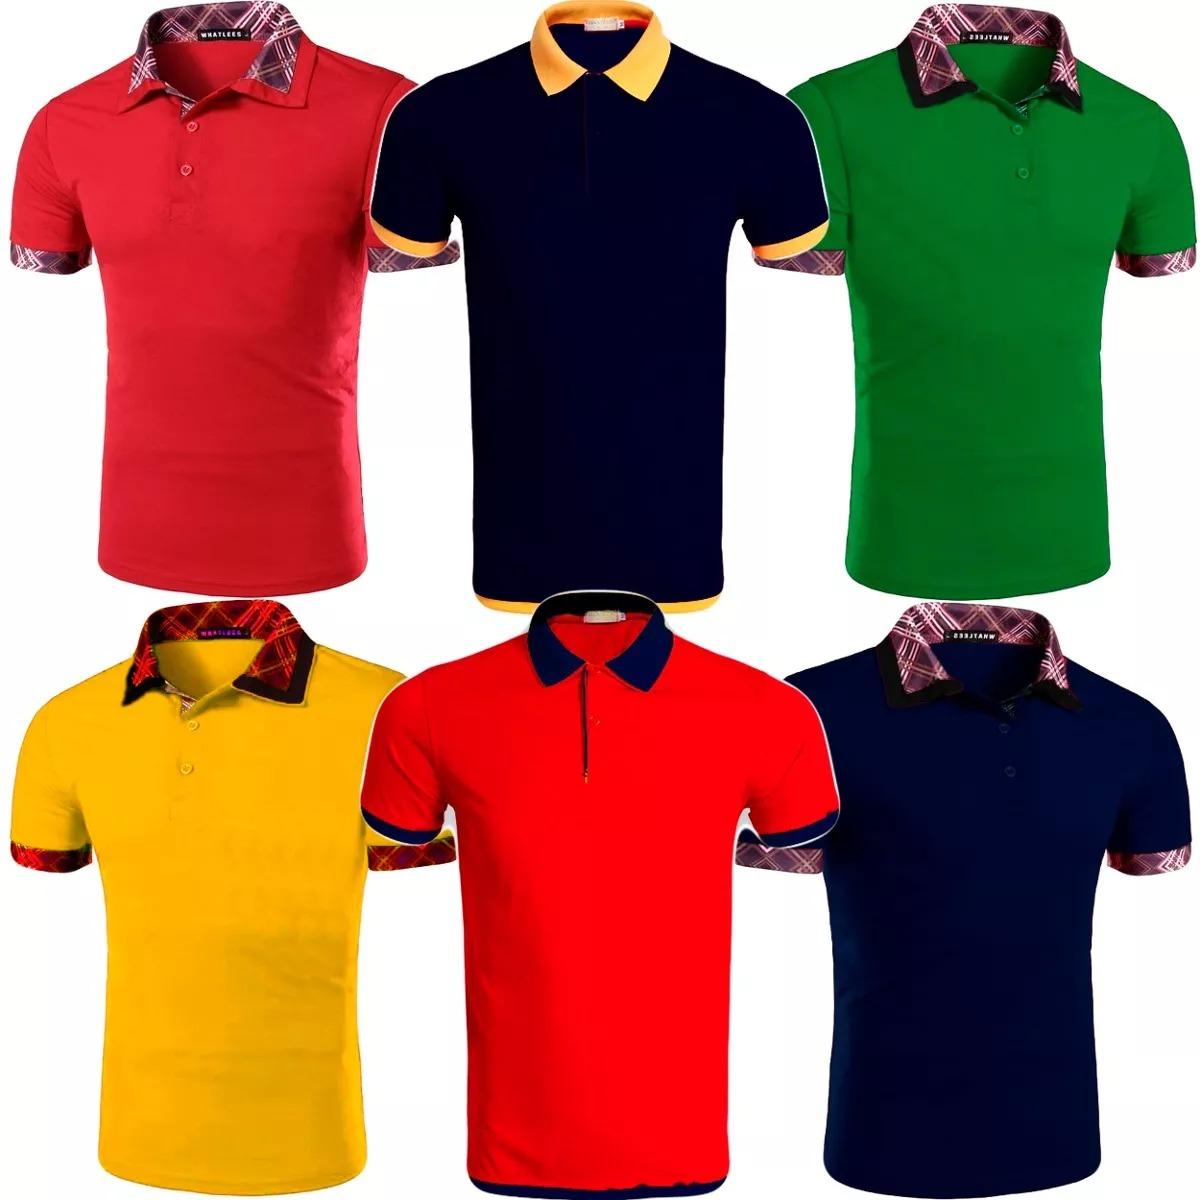 Kit 5 Camisas Polo Masculina Alto Padrao Blusa Camiseta Polo - R .. db1f6214c9c4f